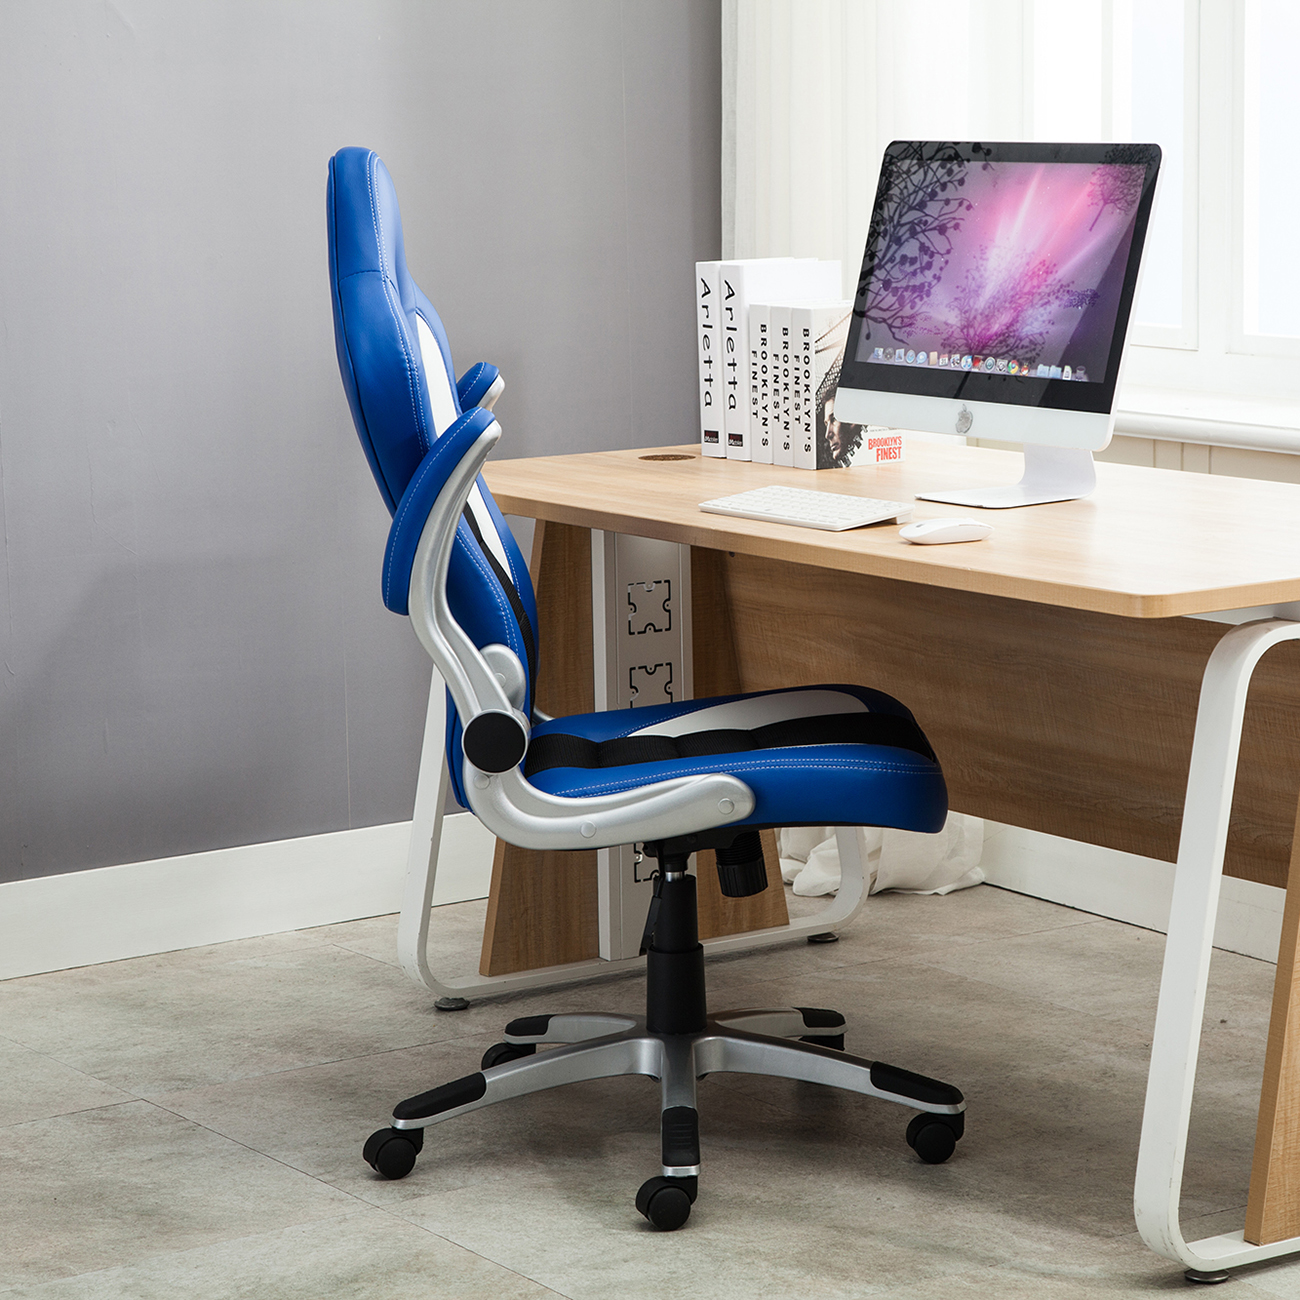 Ergonomic Computer Desk Office Chair Ergonomic Computer Pu Leather Desk Race Car Bucket